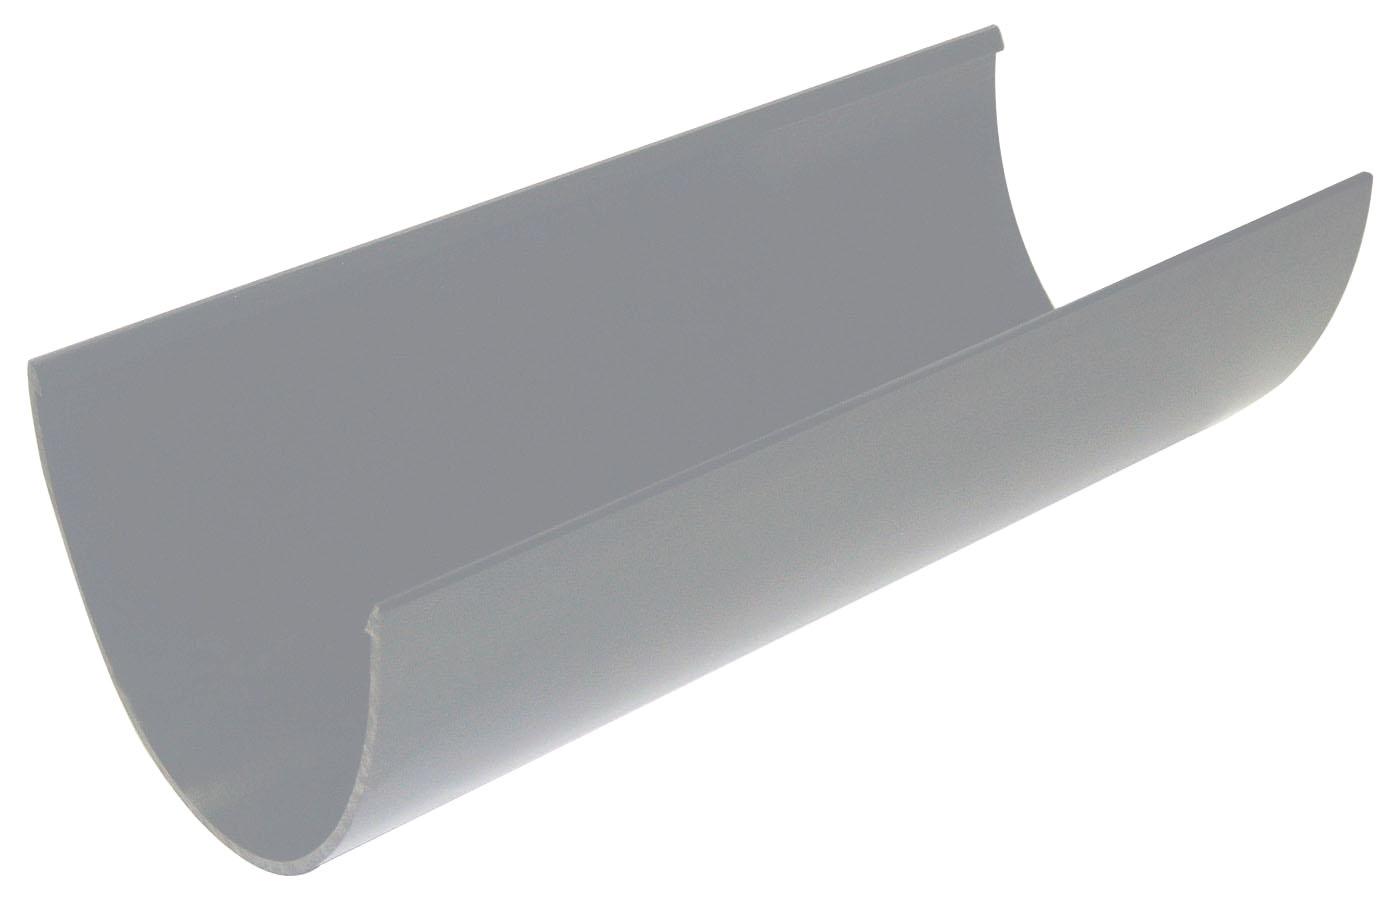 Floplast RGH4GR 115mm Hi-Cap (Deepflow) Gutter 4 Metre - Grey